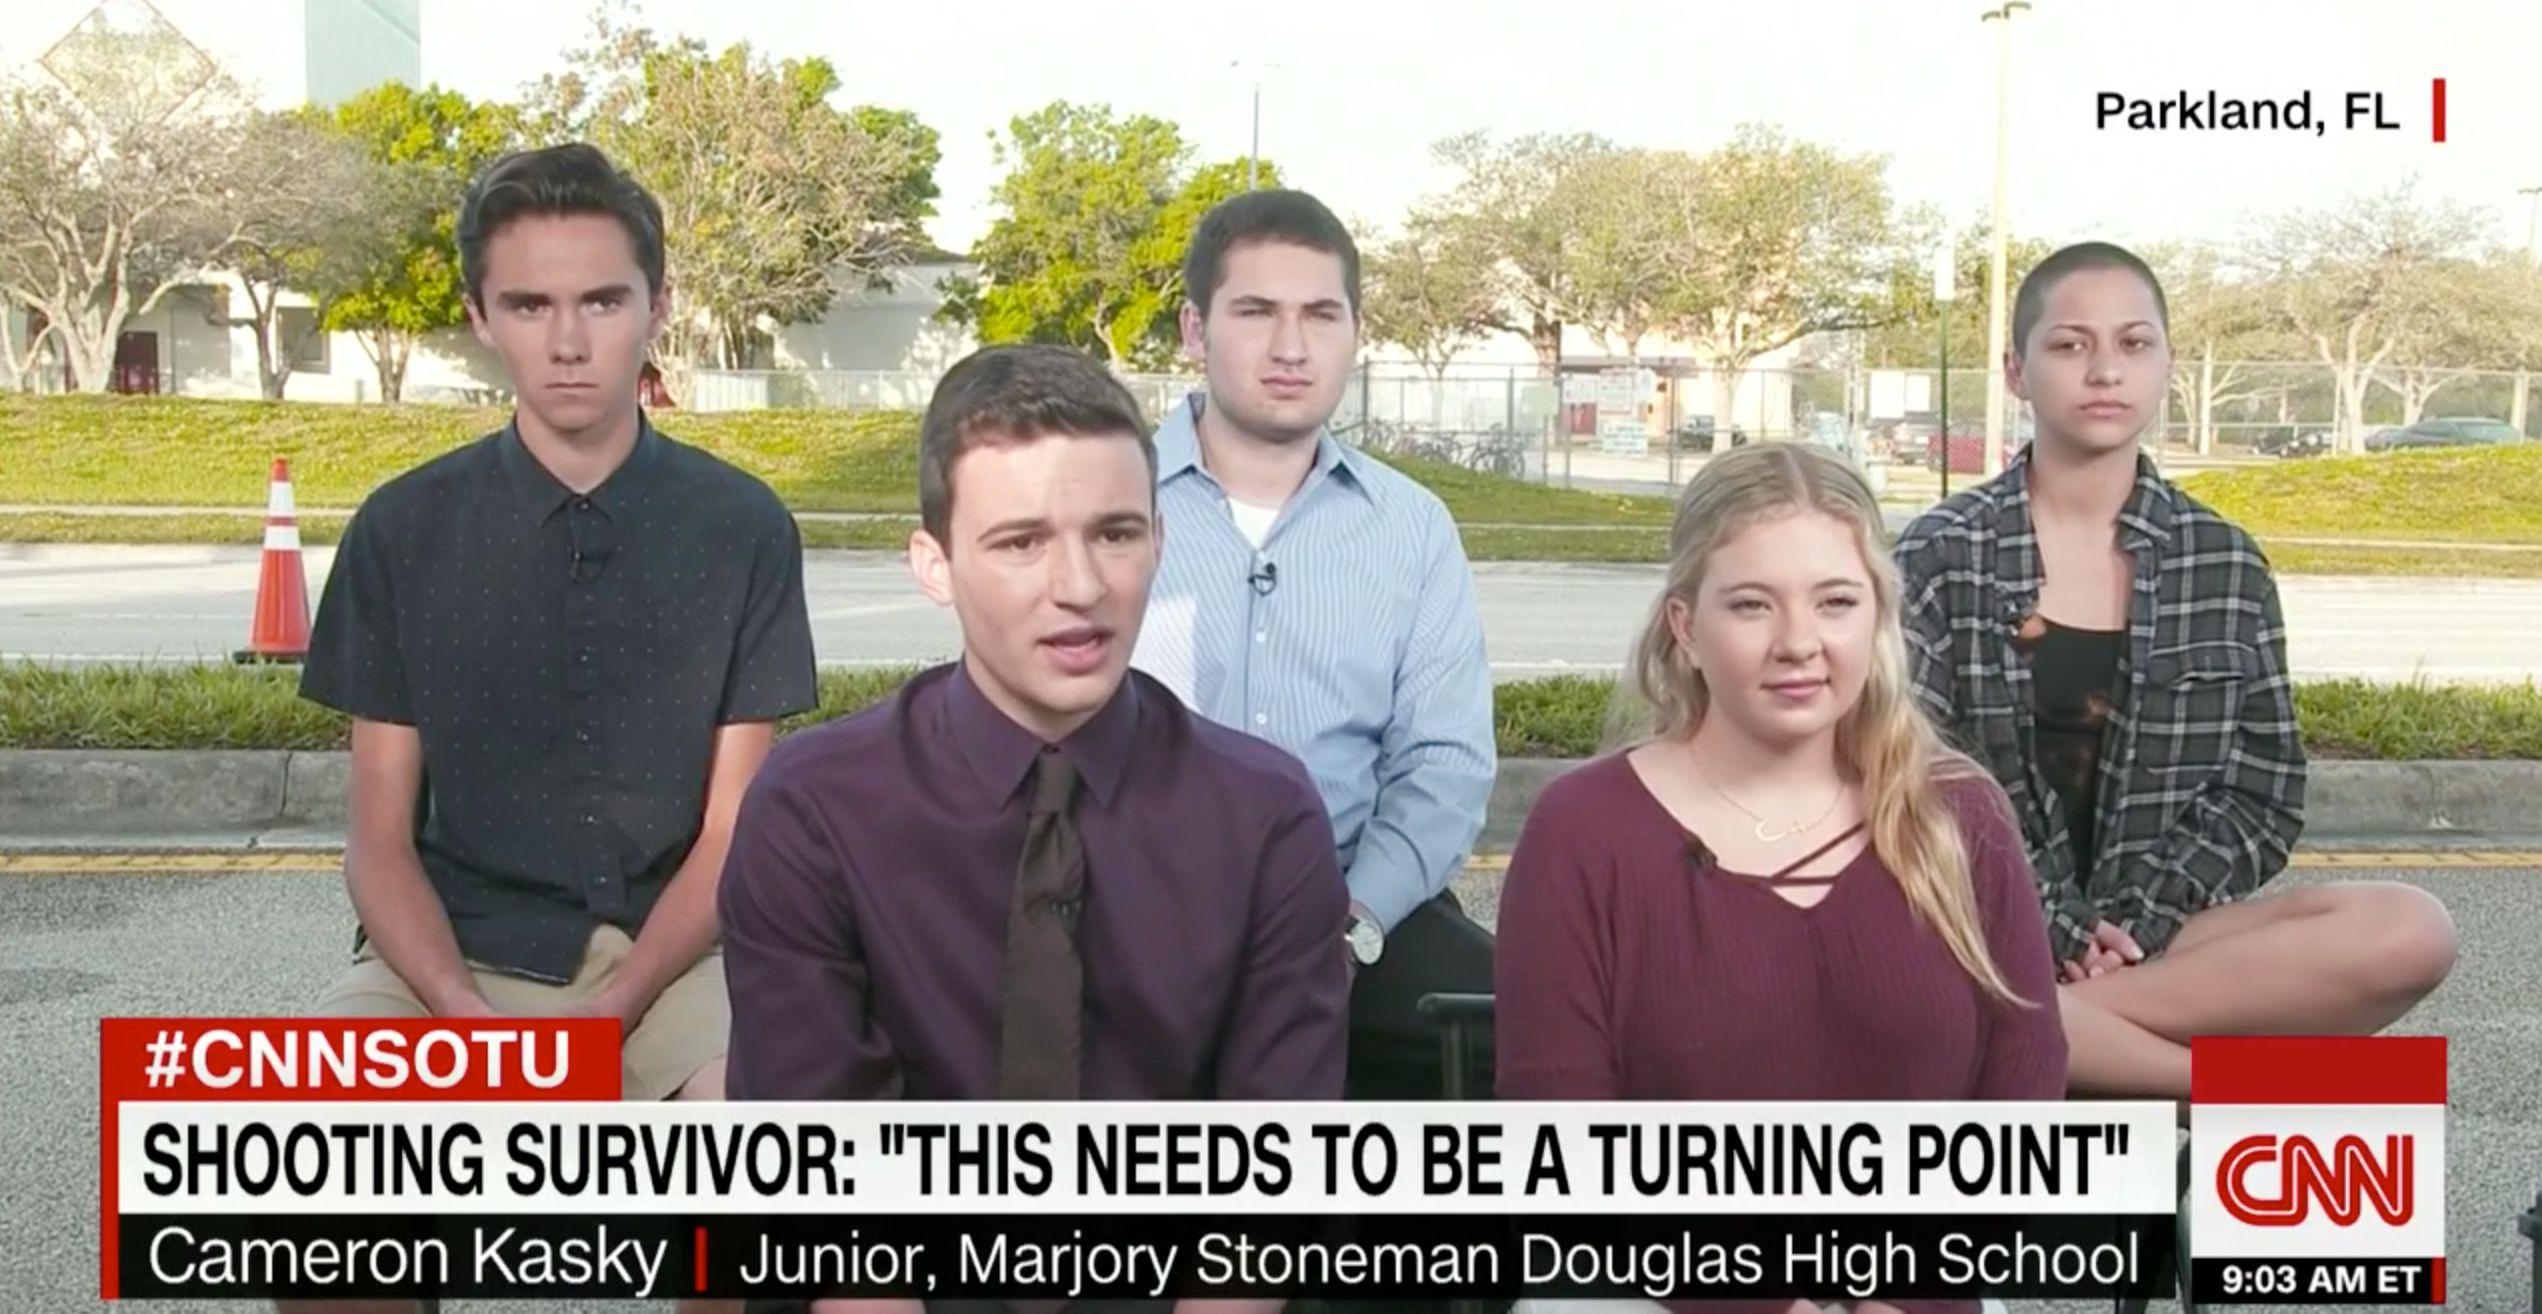 Teen Survivors Of Florida Shooting To March On Washington For Gun Law